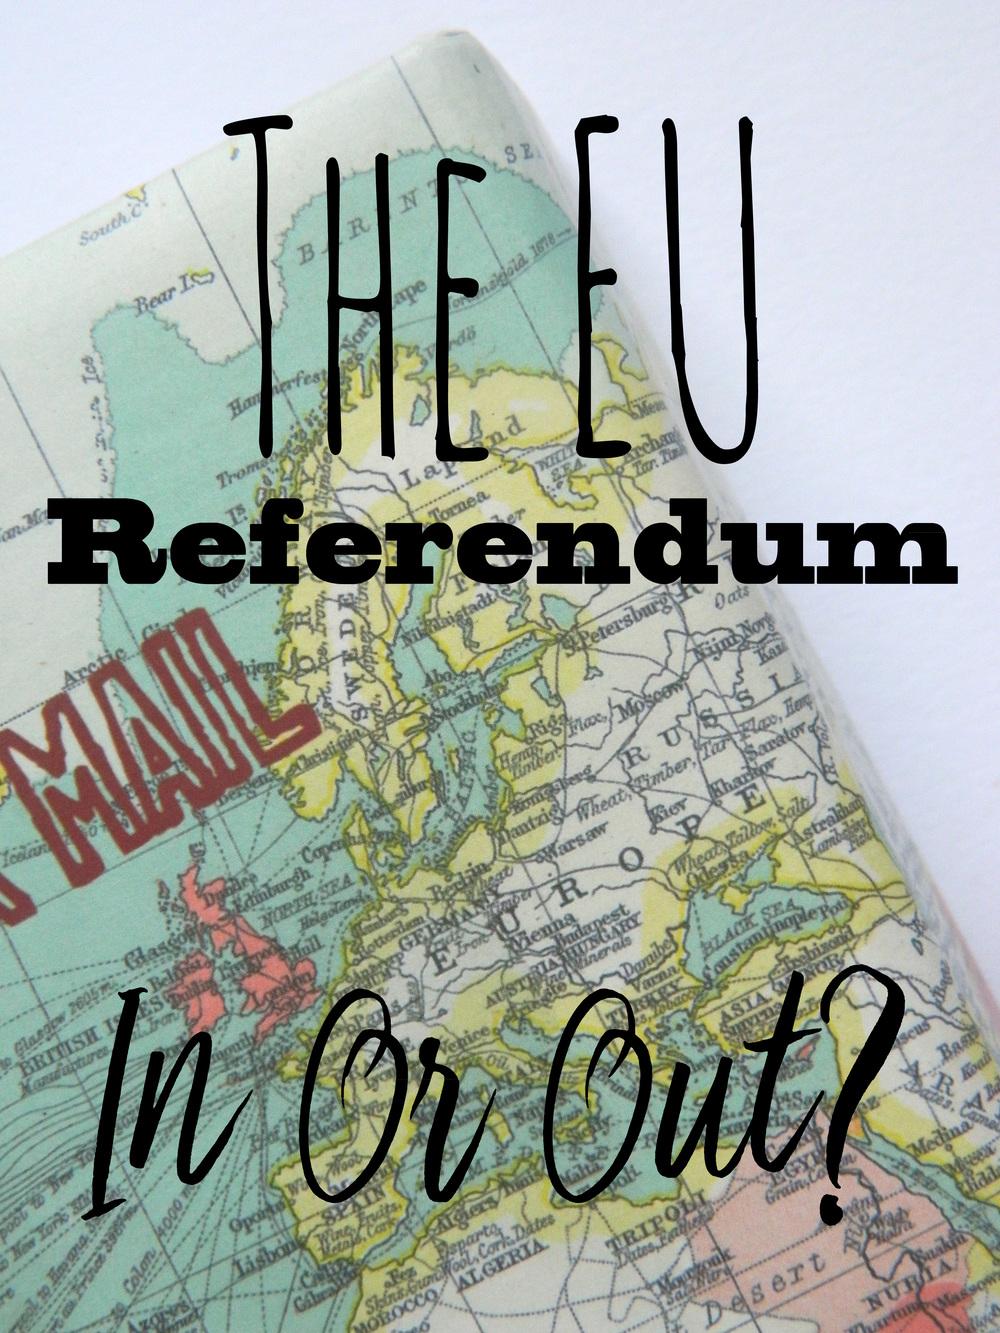 Visit the EU Referendum website here.